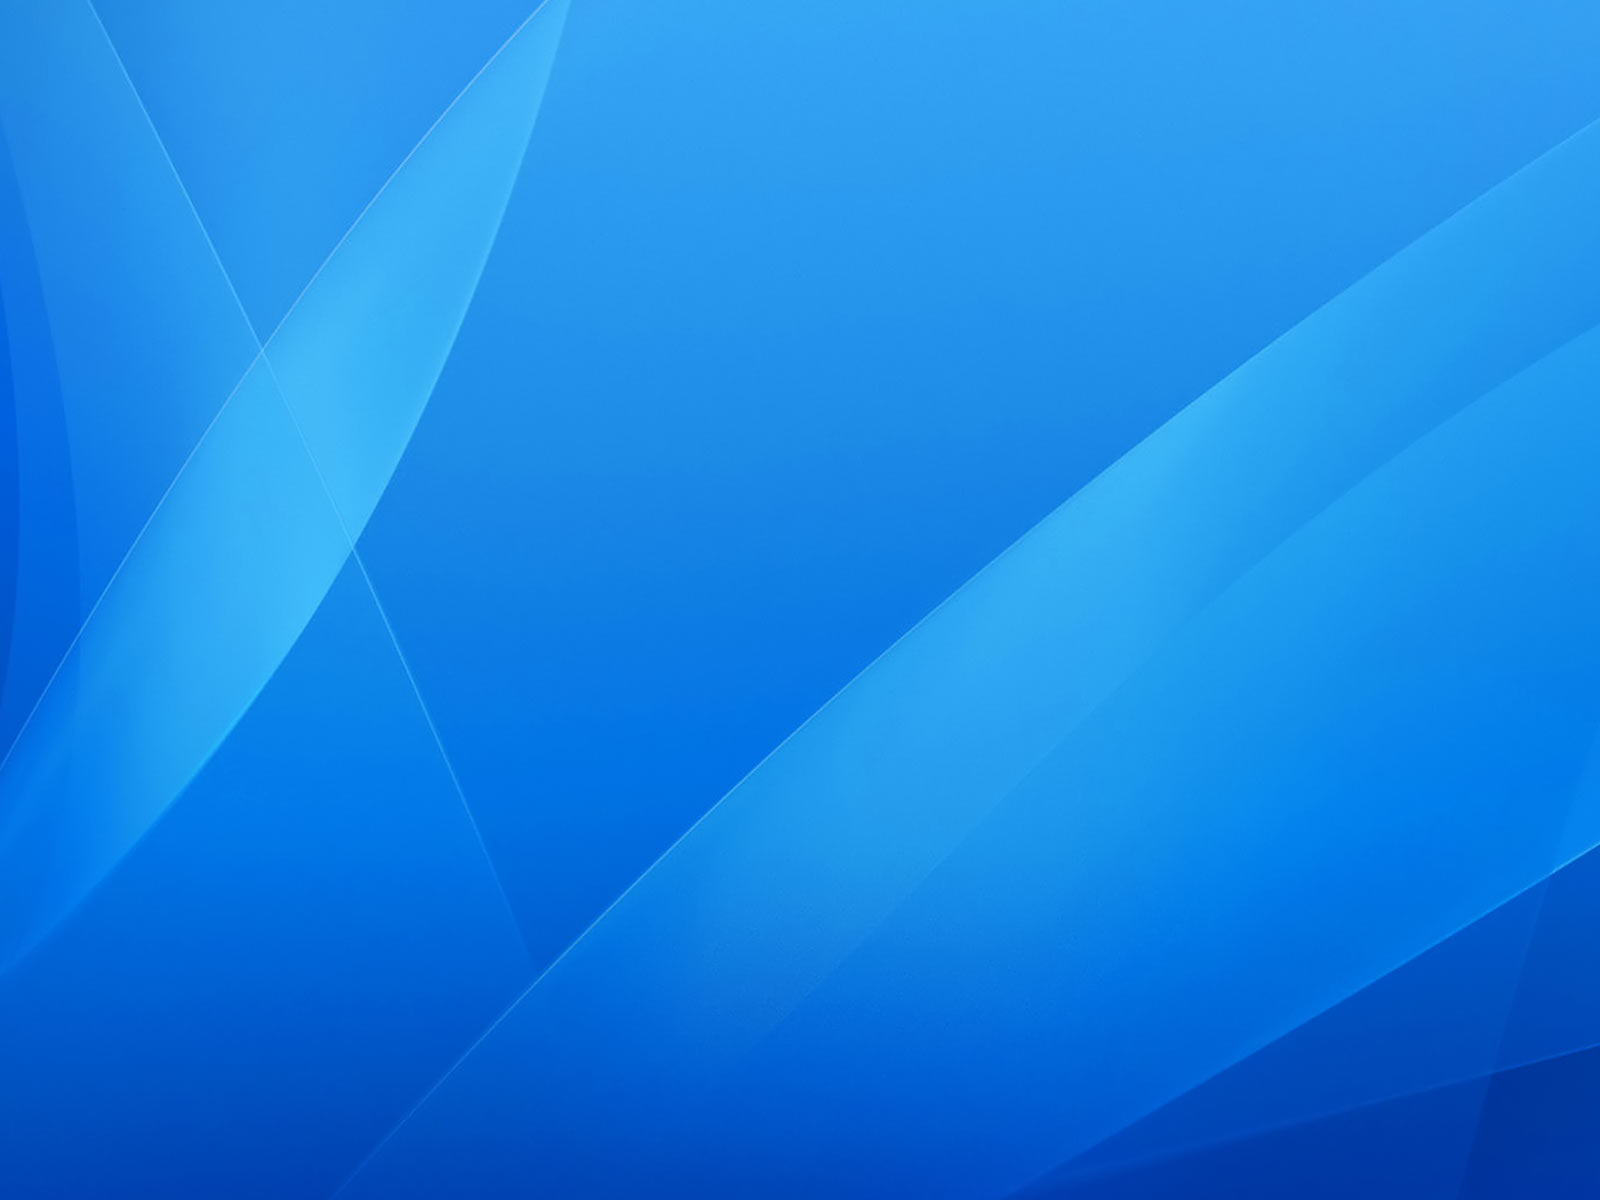 Aqua Blue Curling Ribbon ~ Maybe Navy Blue